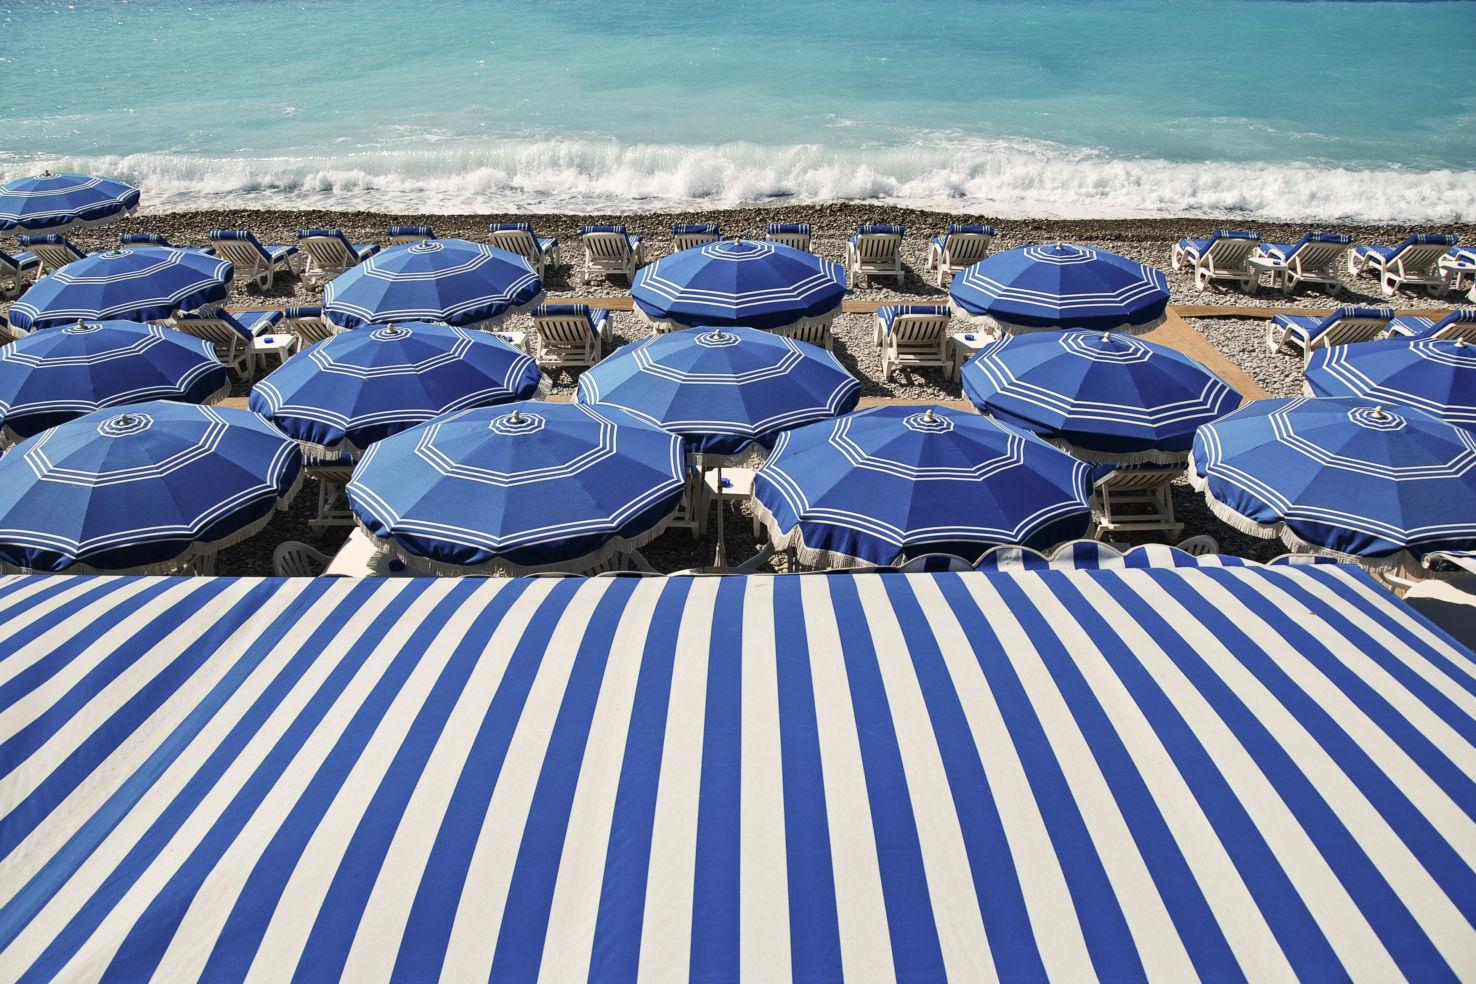 Umbrellas on the beach in Nice, France